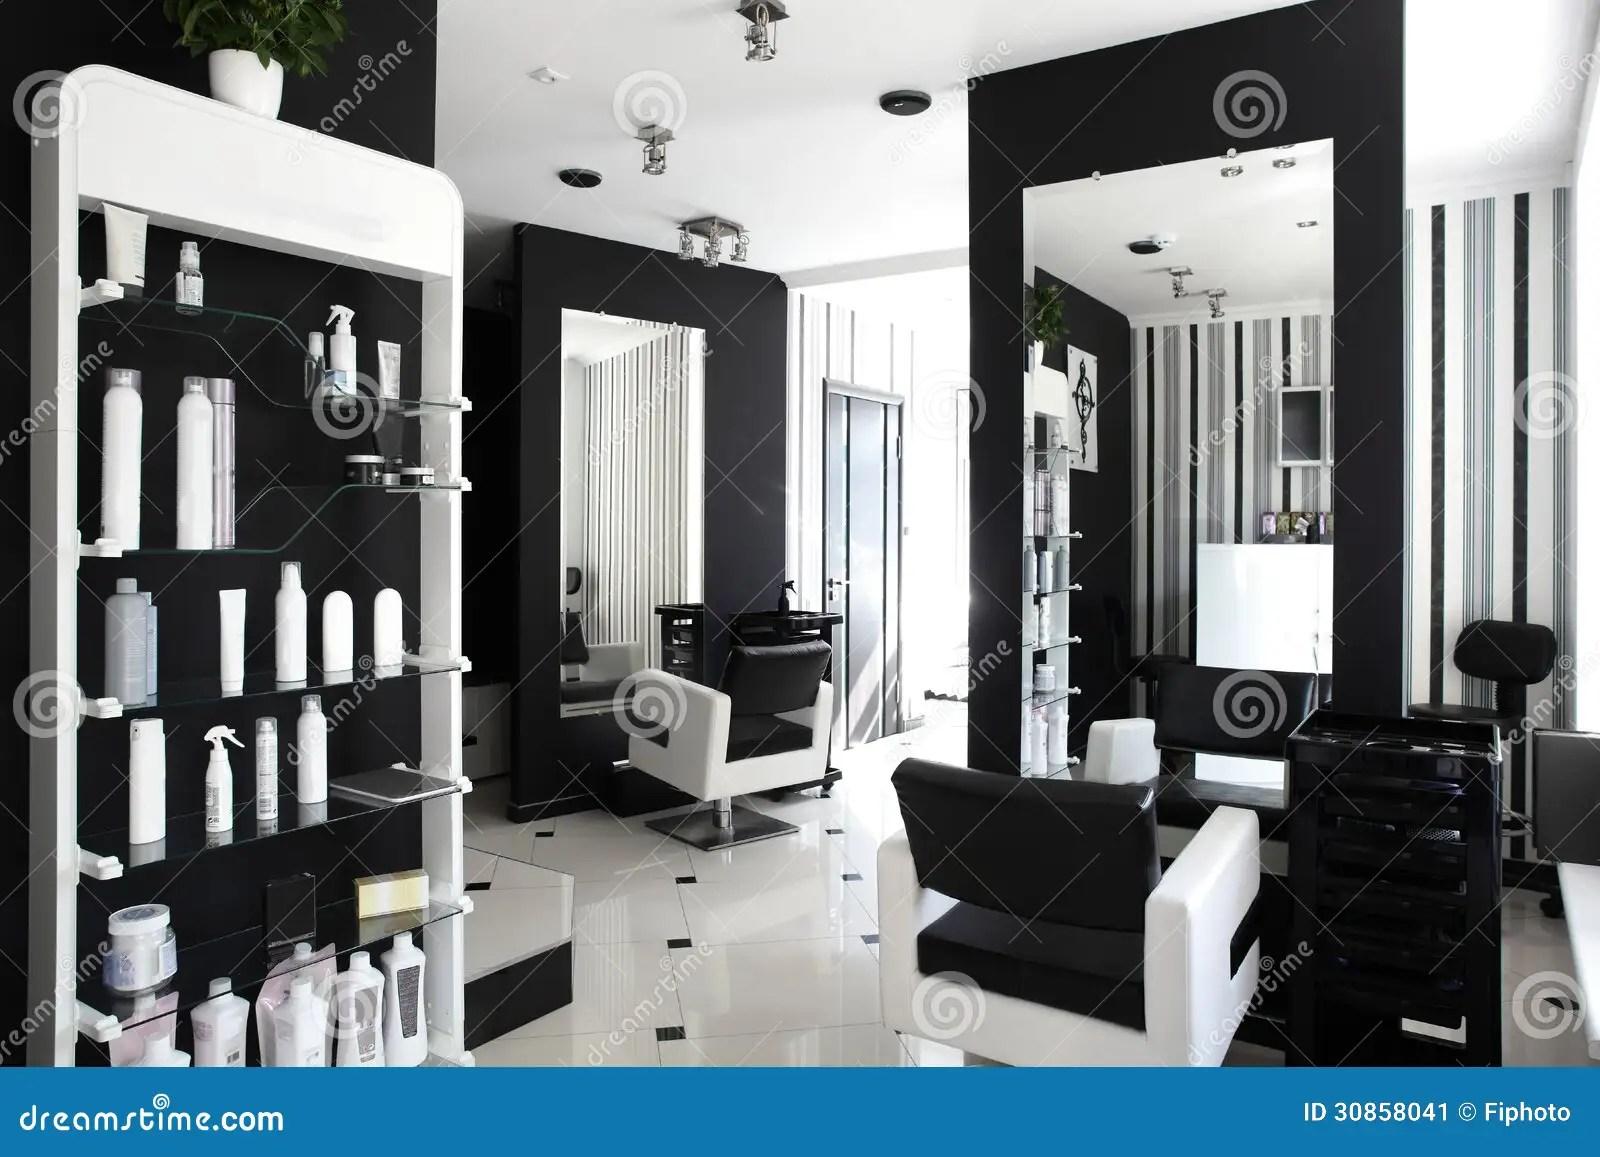 Hair Salon Floor Plans Free